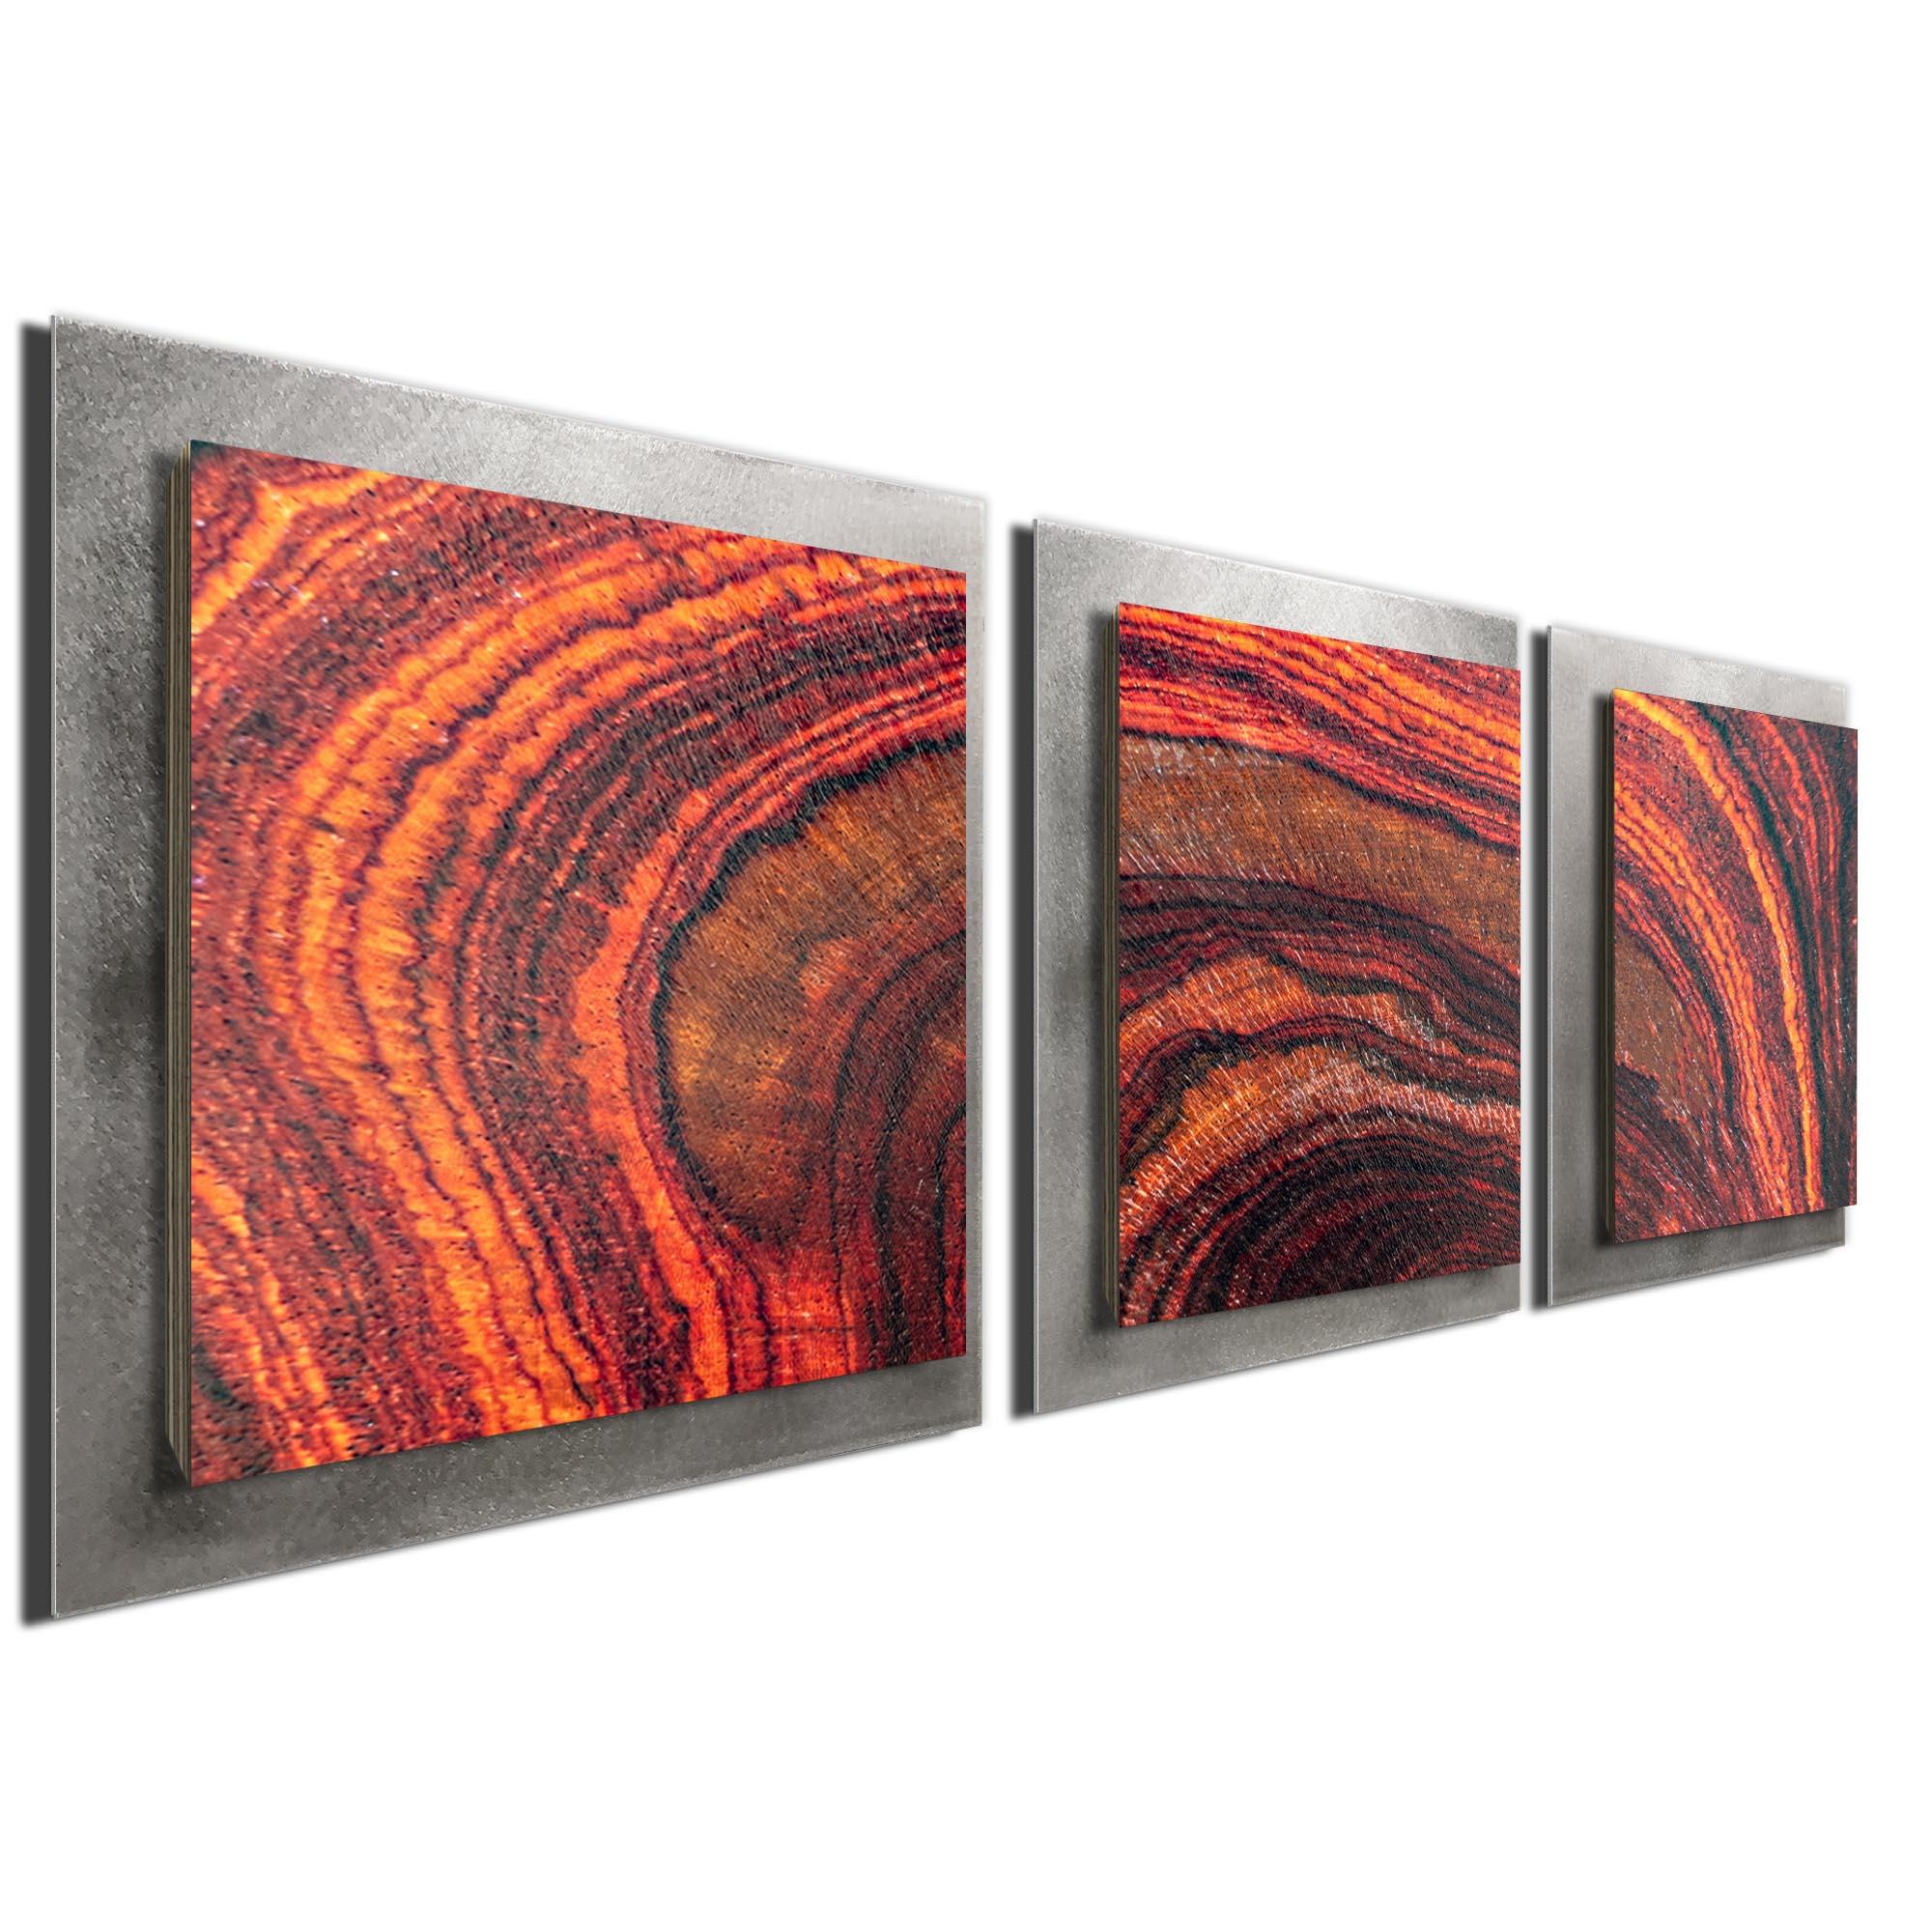 Arched Wood Essence Silver by Adam Schwoeppe Rustic Modern Style Wood Wall Art - Image 2